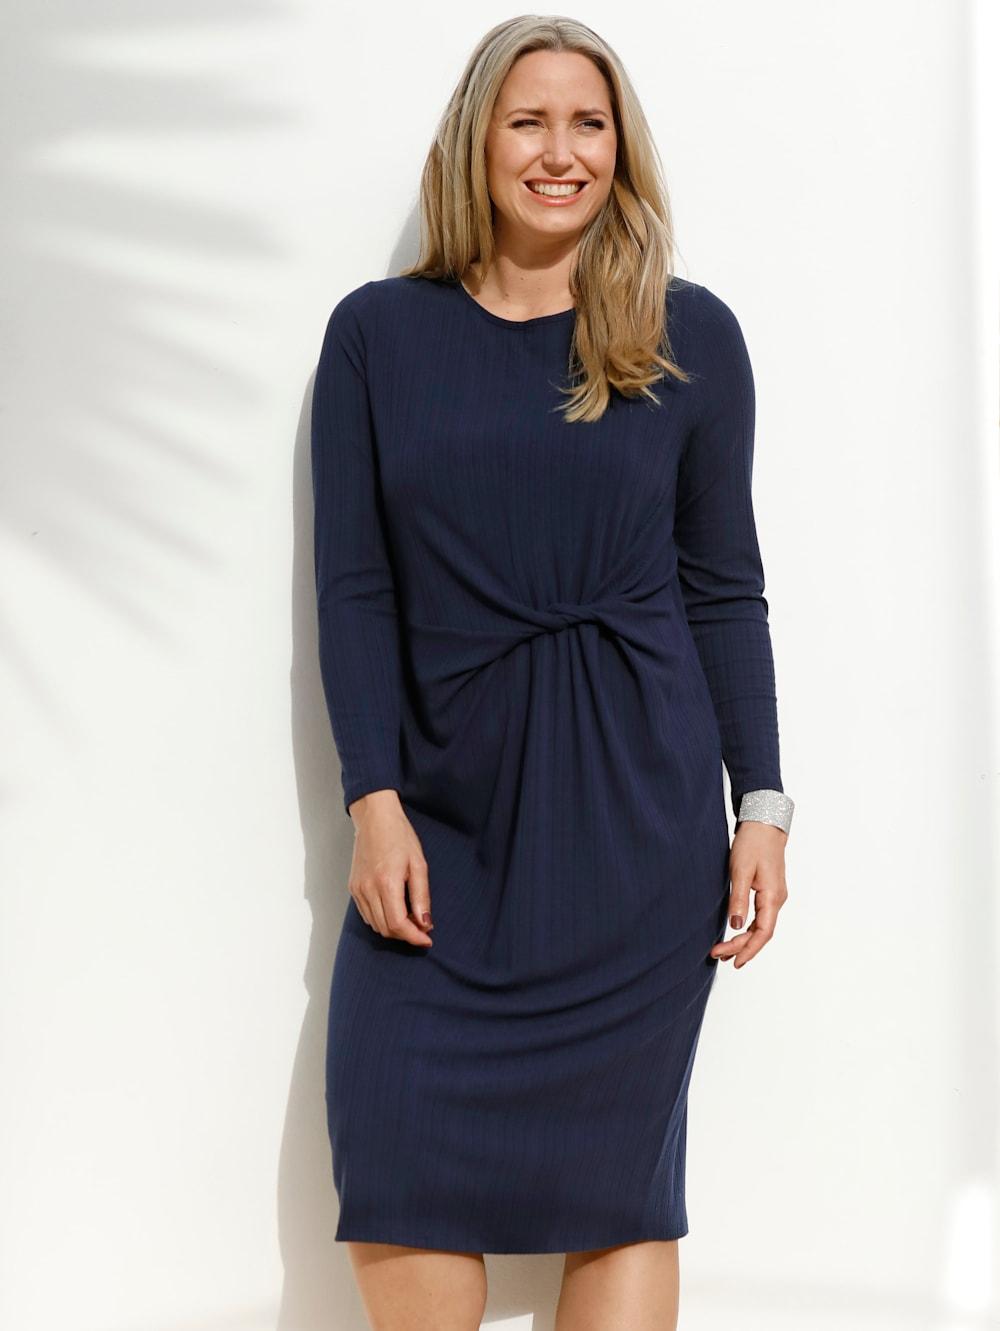 MIAMODA Jerseykleid mit Knotendetail in der Taille  Mia Moda